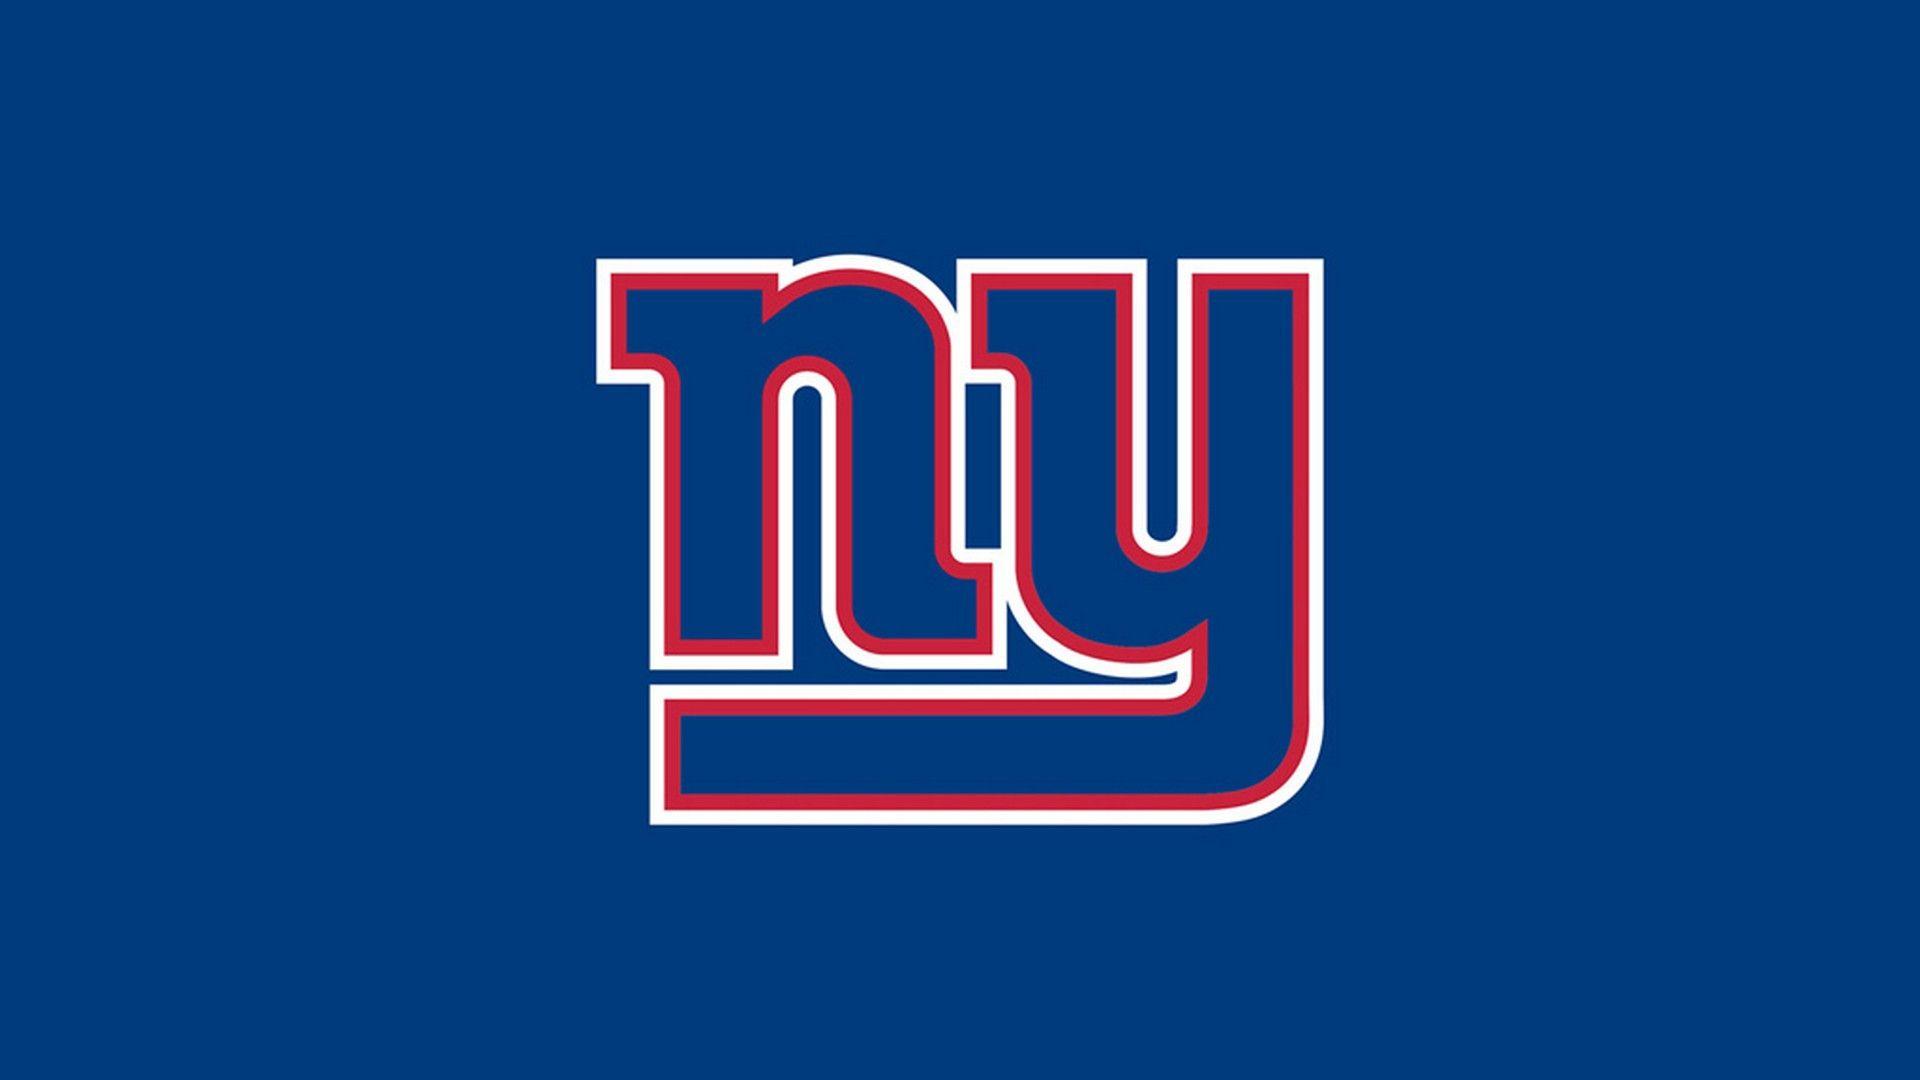 New York Giants Desktop Wallpaper 2021 Nfl Football Wallpapers Ny Giants Football New York Giants Football New York Giants Logo